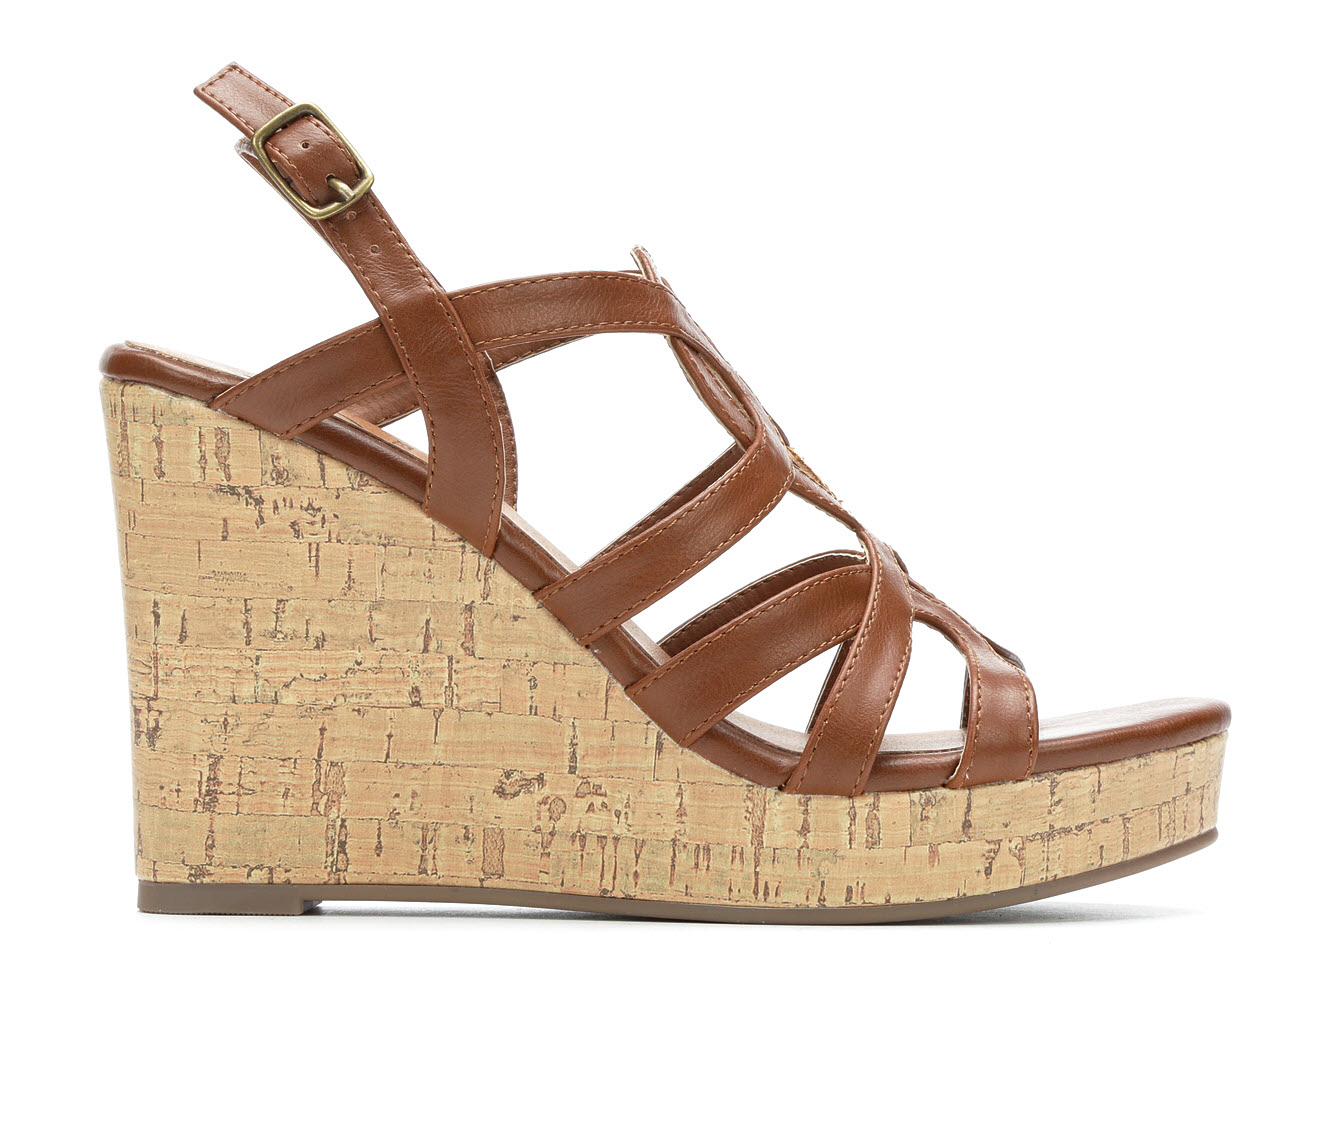 Daisy Fuentes Susie Women's Dress Shoe (Brown Faux Leather)